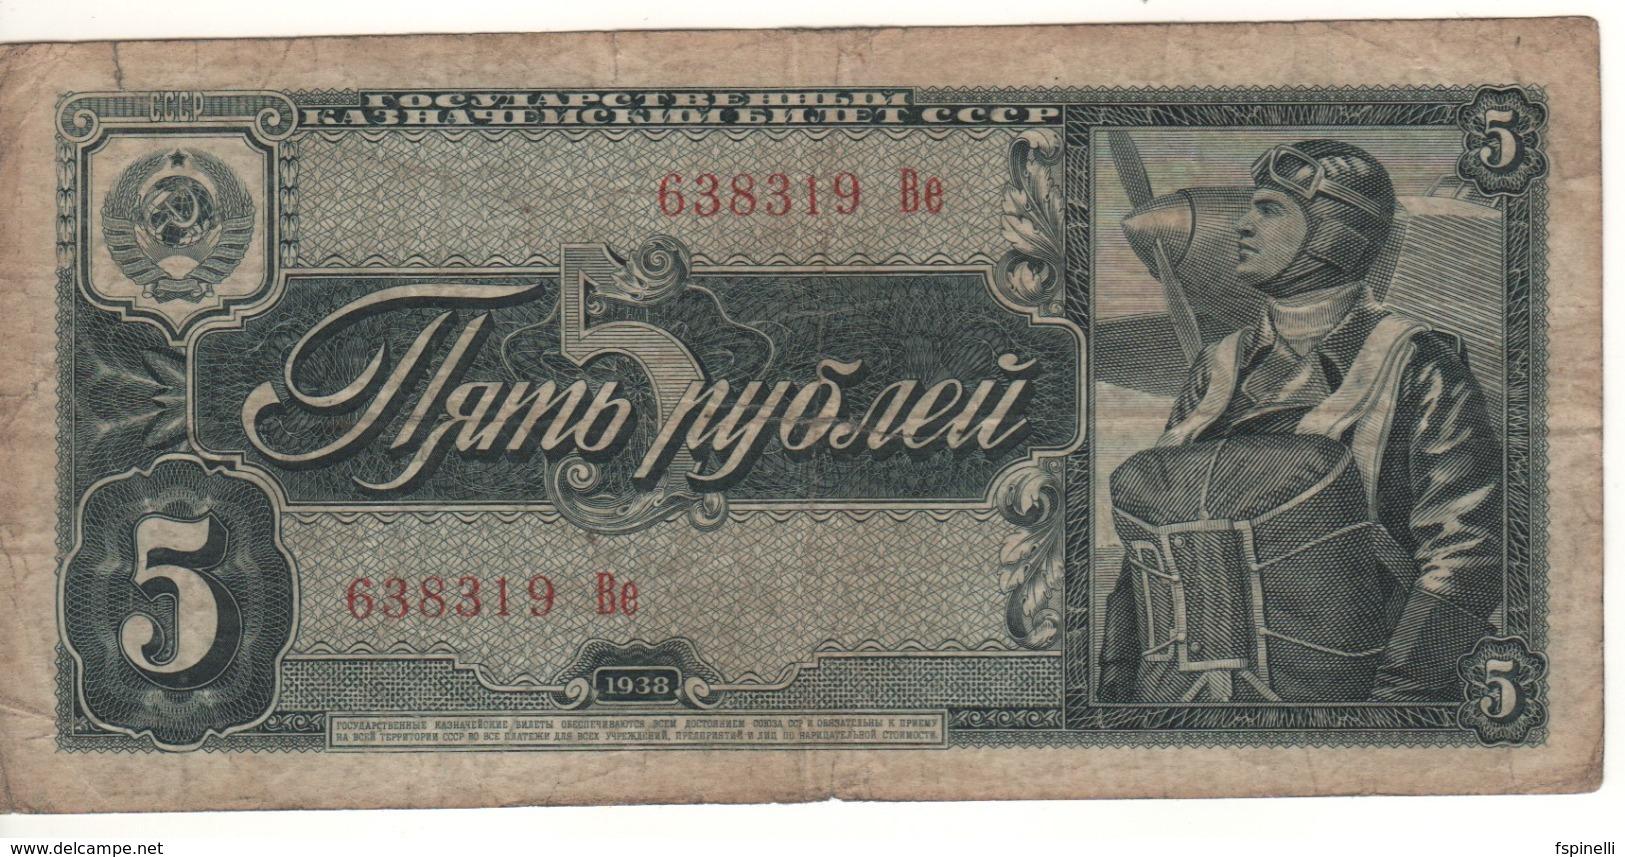 RUSSIA   5  Rubles       P215   1938  *Pilot* - Russia